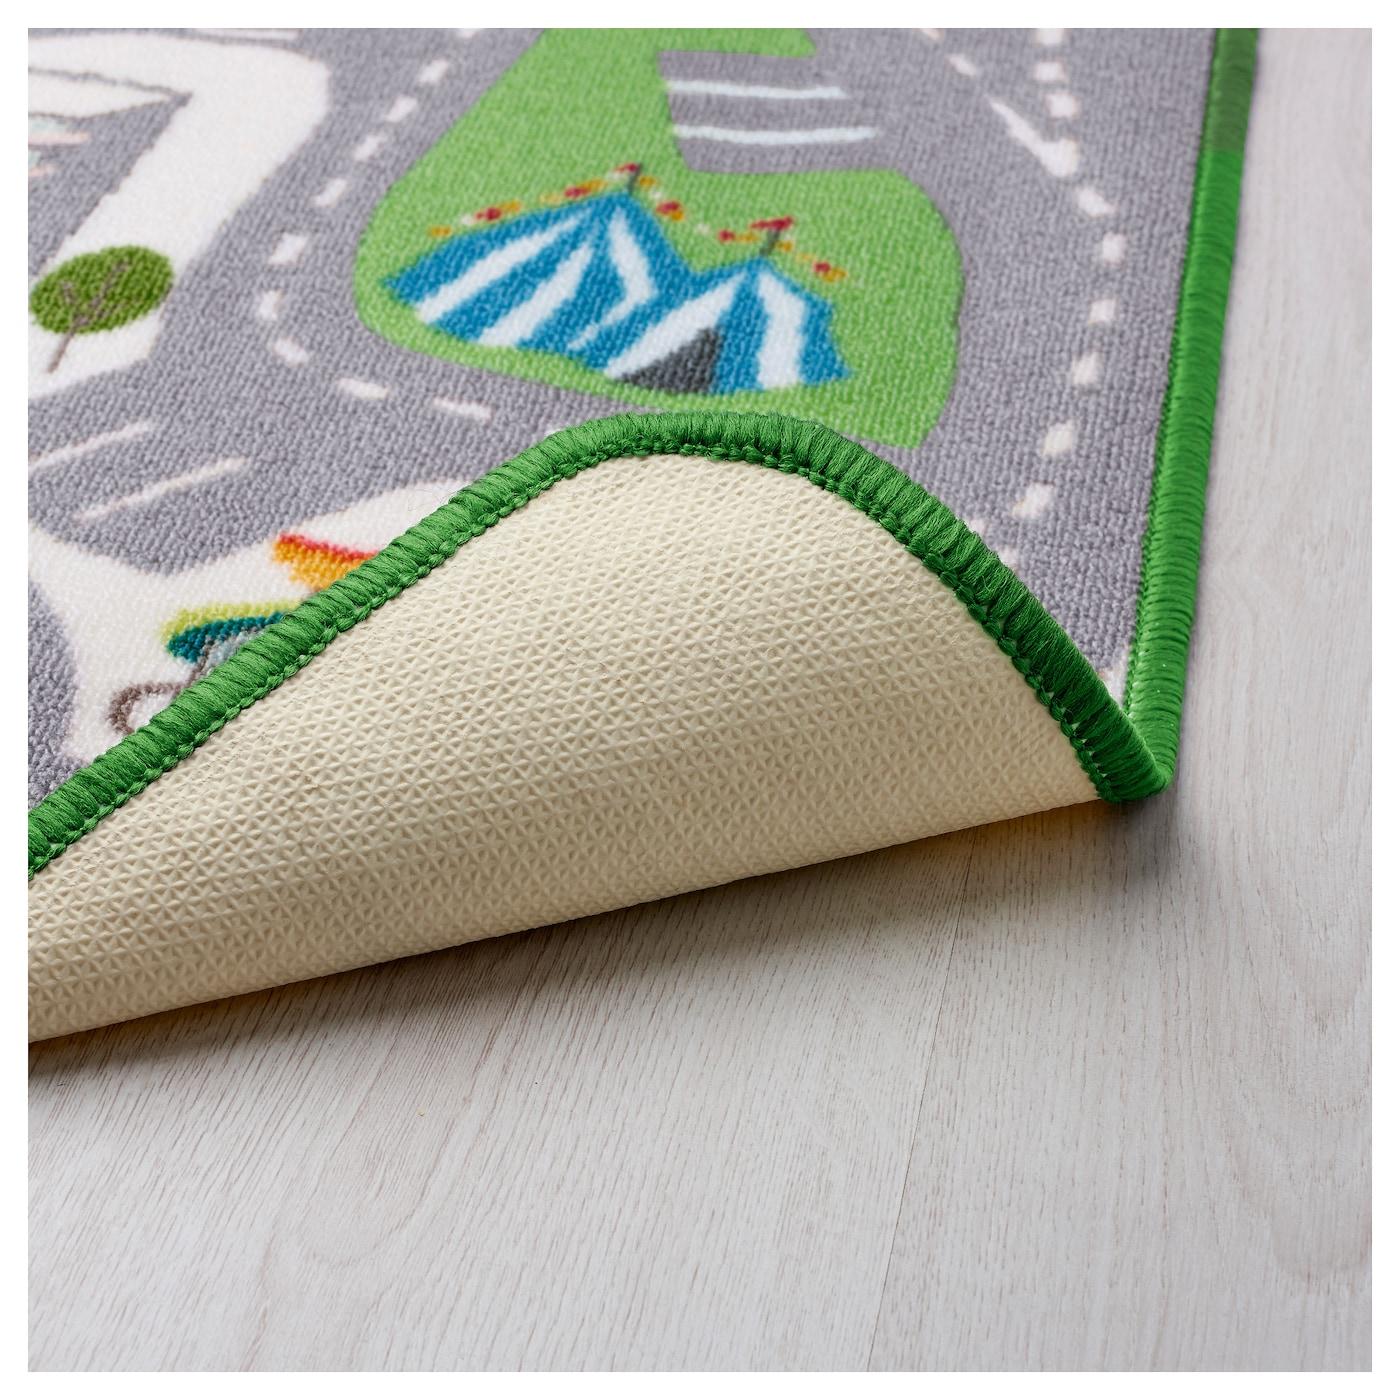 Lekplats rug low pile multicolour 133x140 cm ikea for Ikea childrens rugs